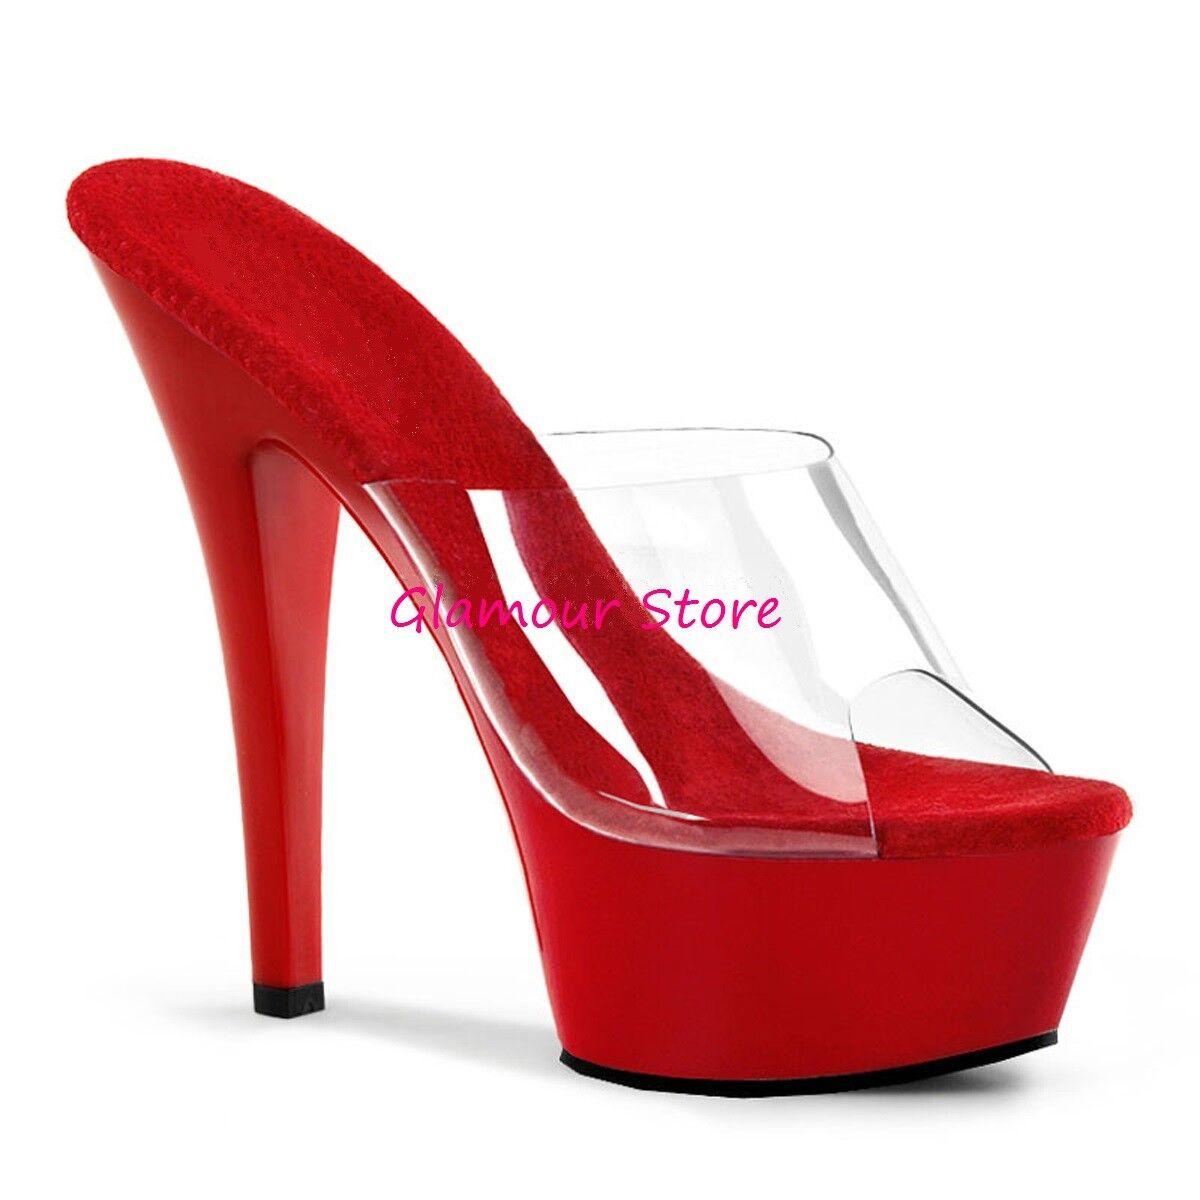 Sexy SANDALI tacco 15 dal 35 al 44 ROSSO/TRASPARENTE plateau sabot scarpe club